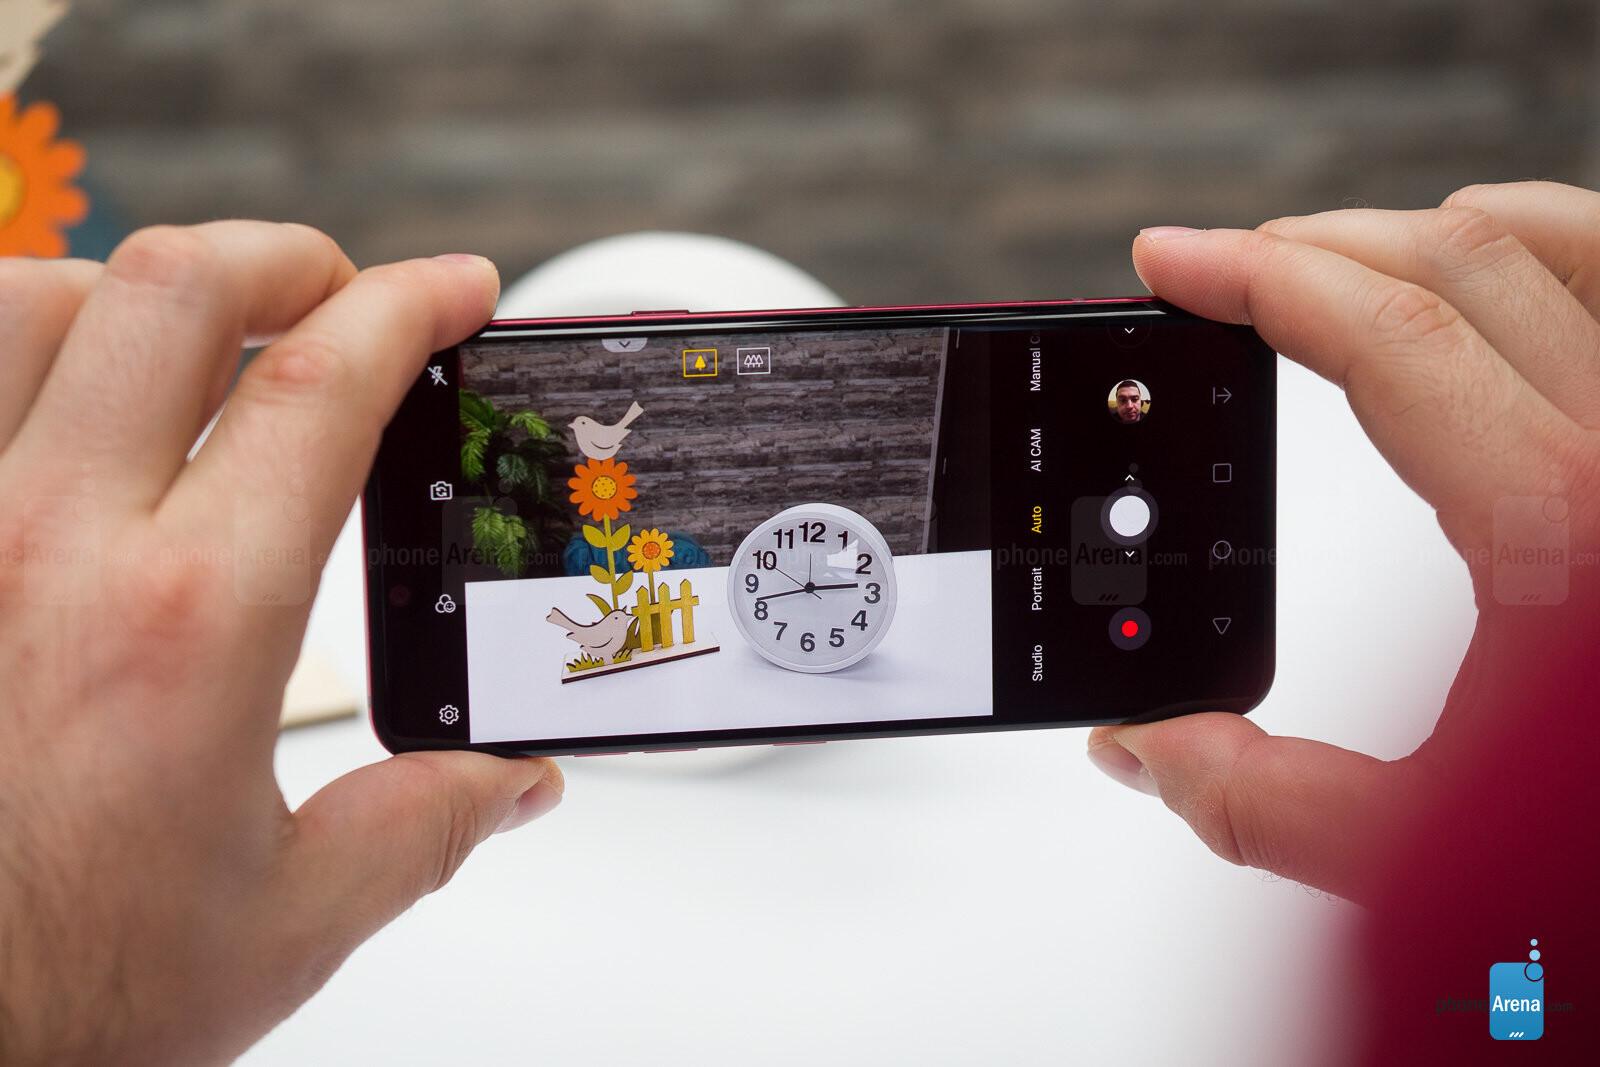 LG G8 ThinQ review: 8 key takeaways - PhoneArena